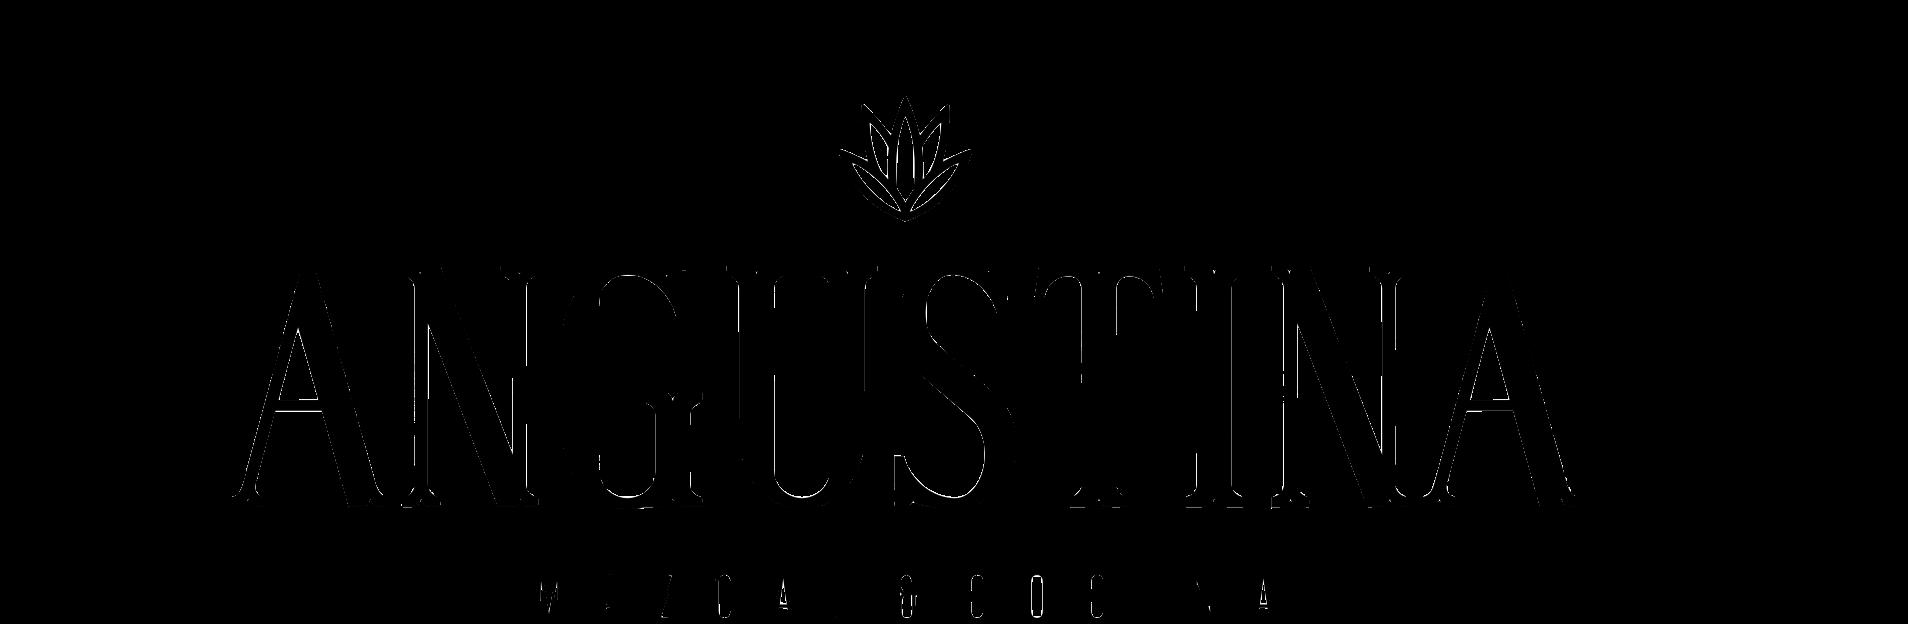 Angustina-LogoOK.png